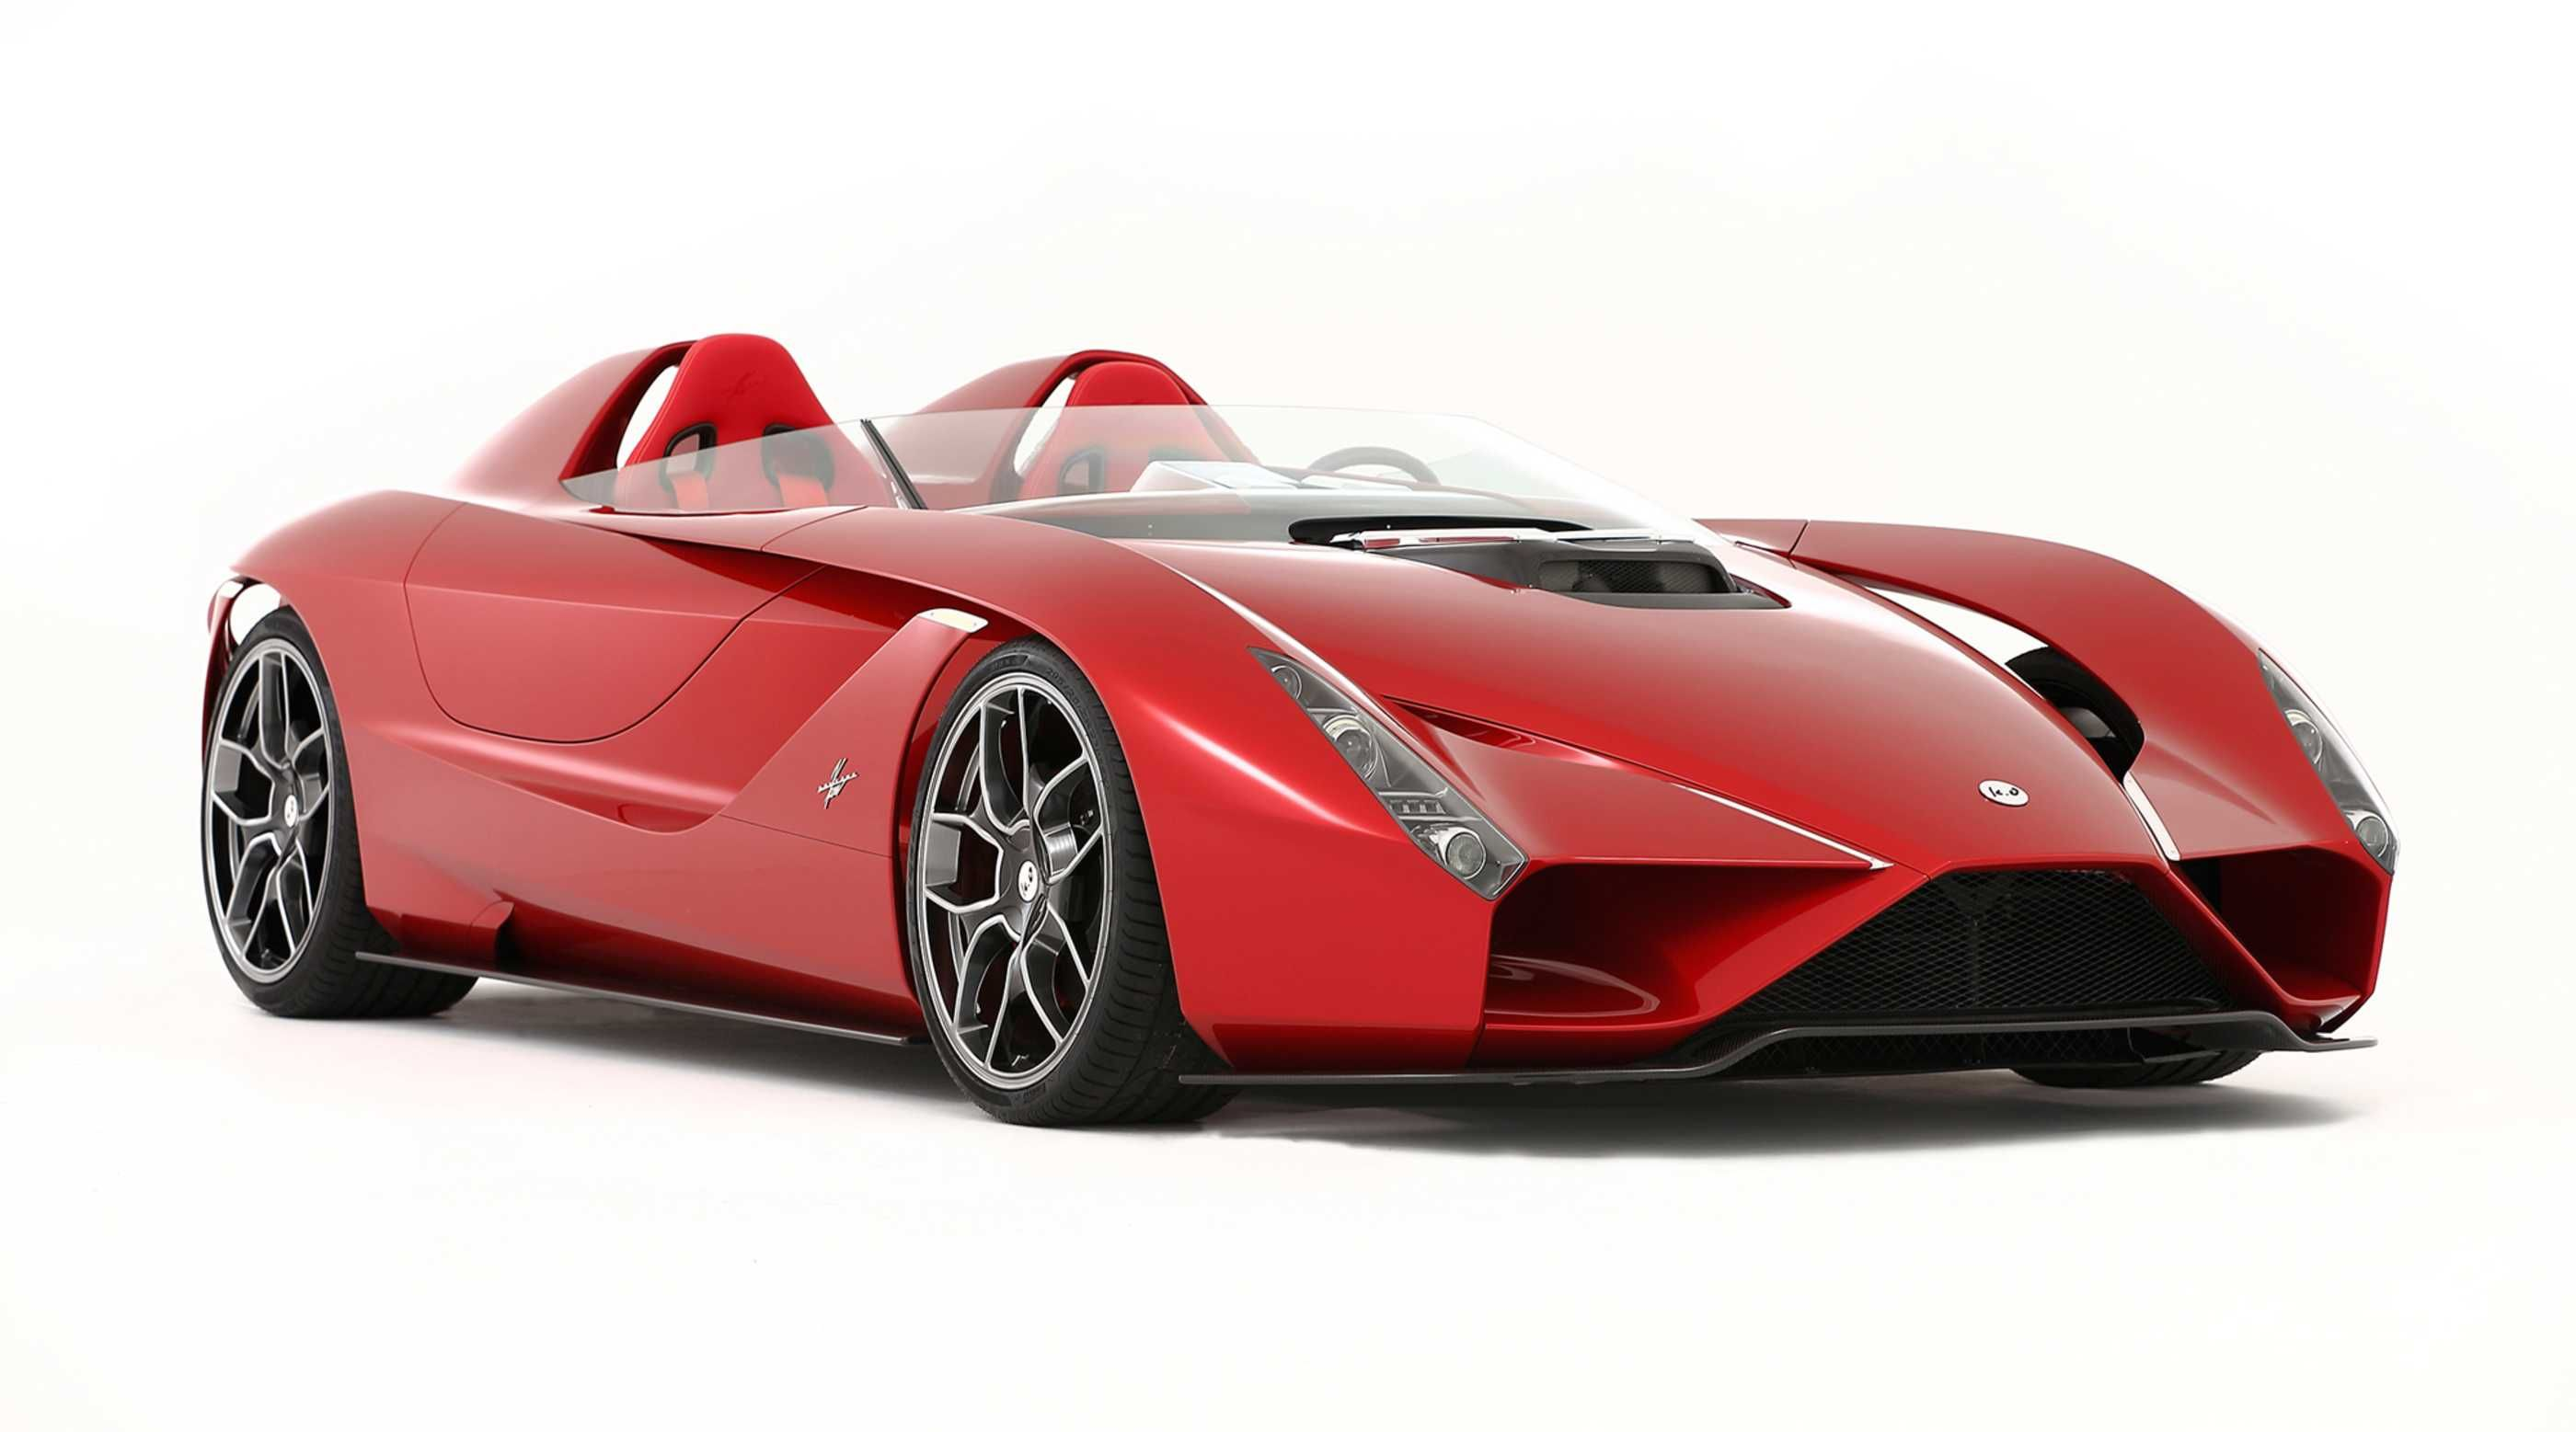 Former Ferrari Designer Ken Okuyama Announces His Own Supercar Superauto Ferrari Peugeot